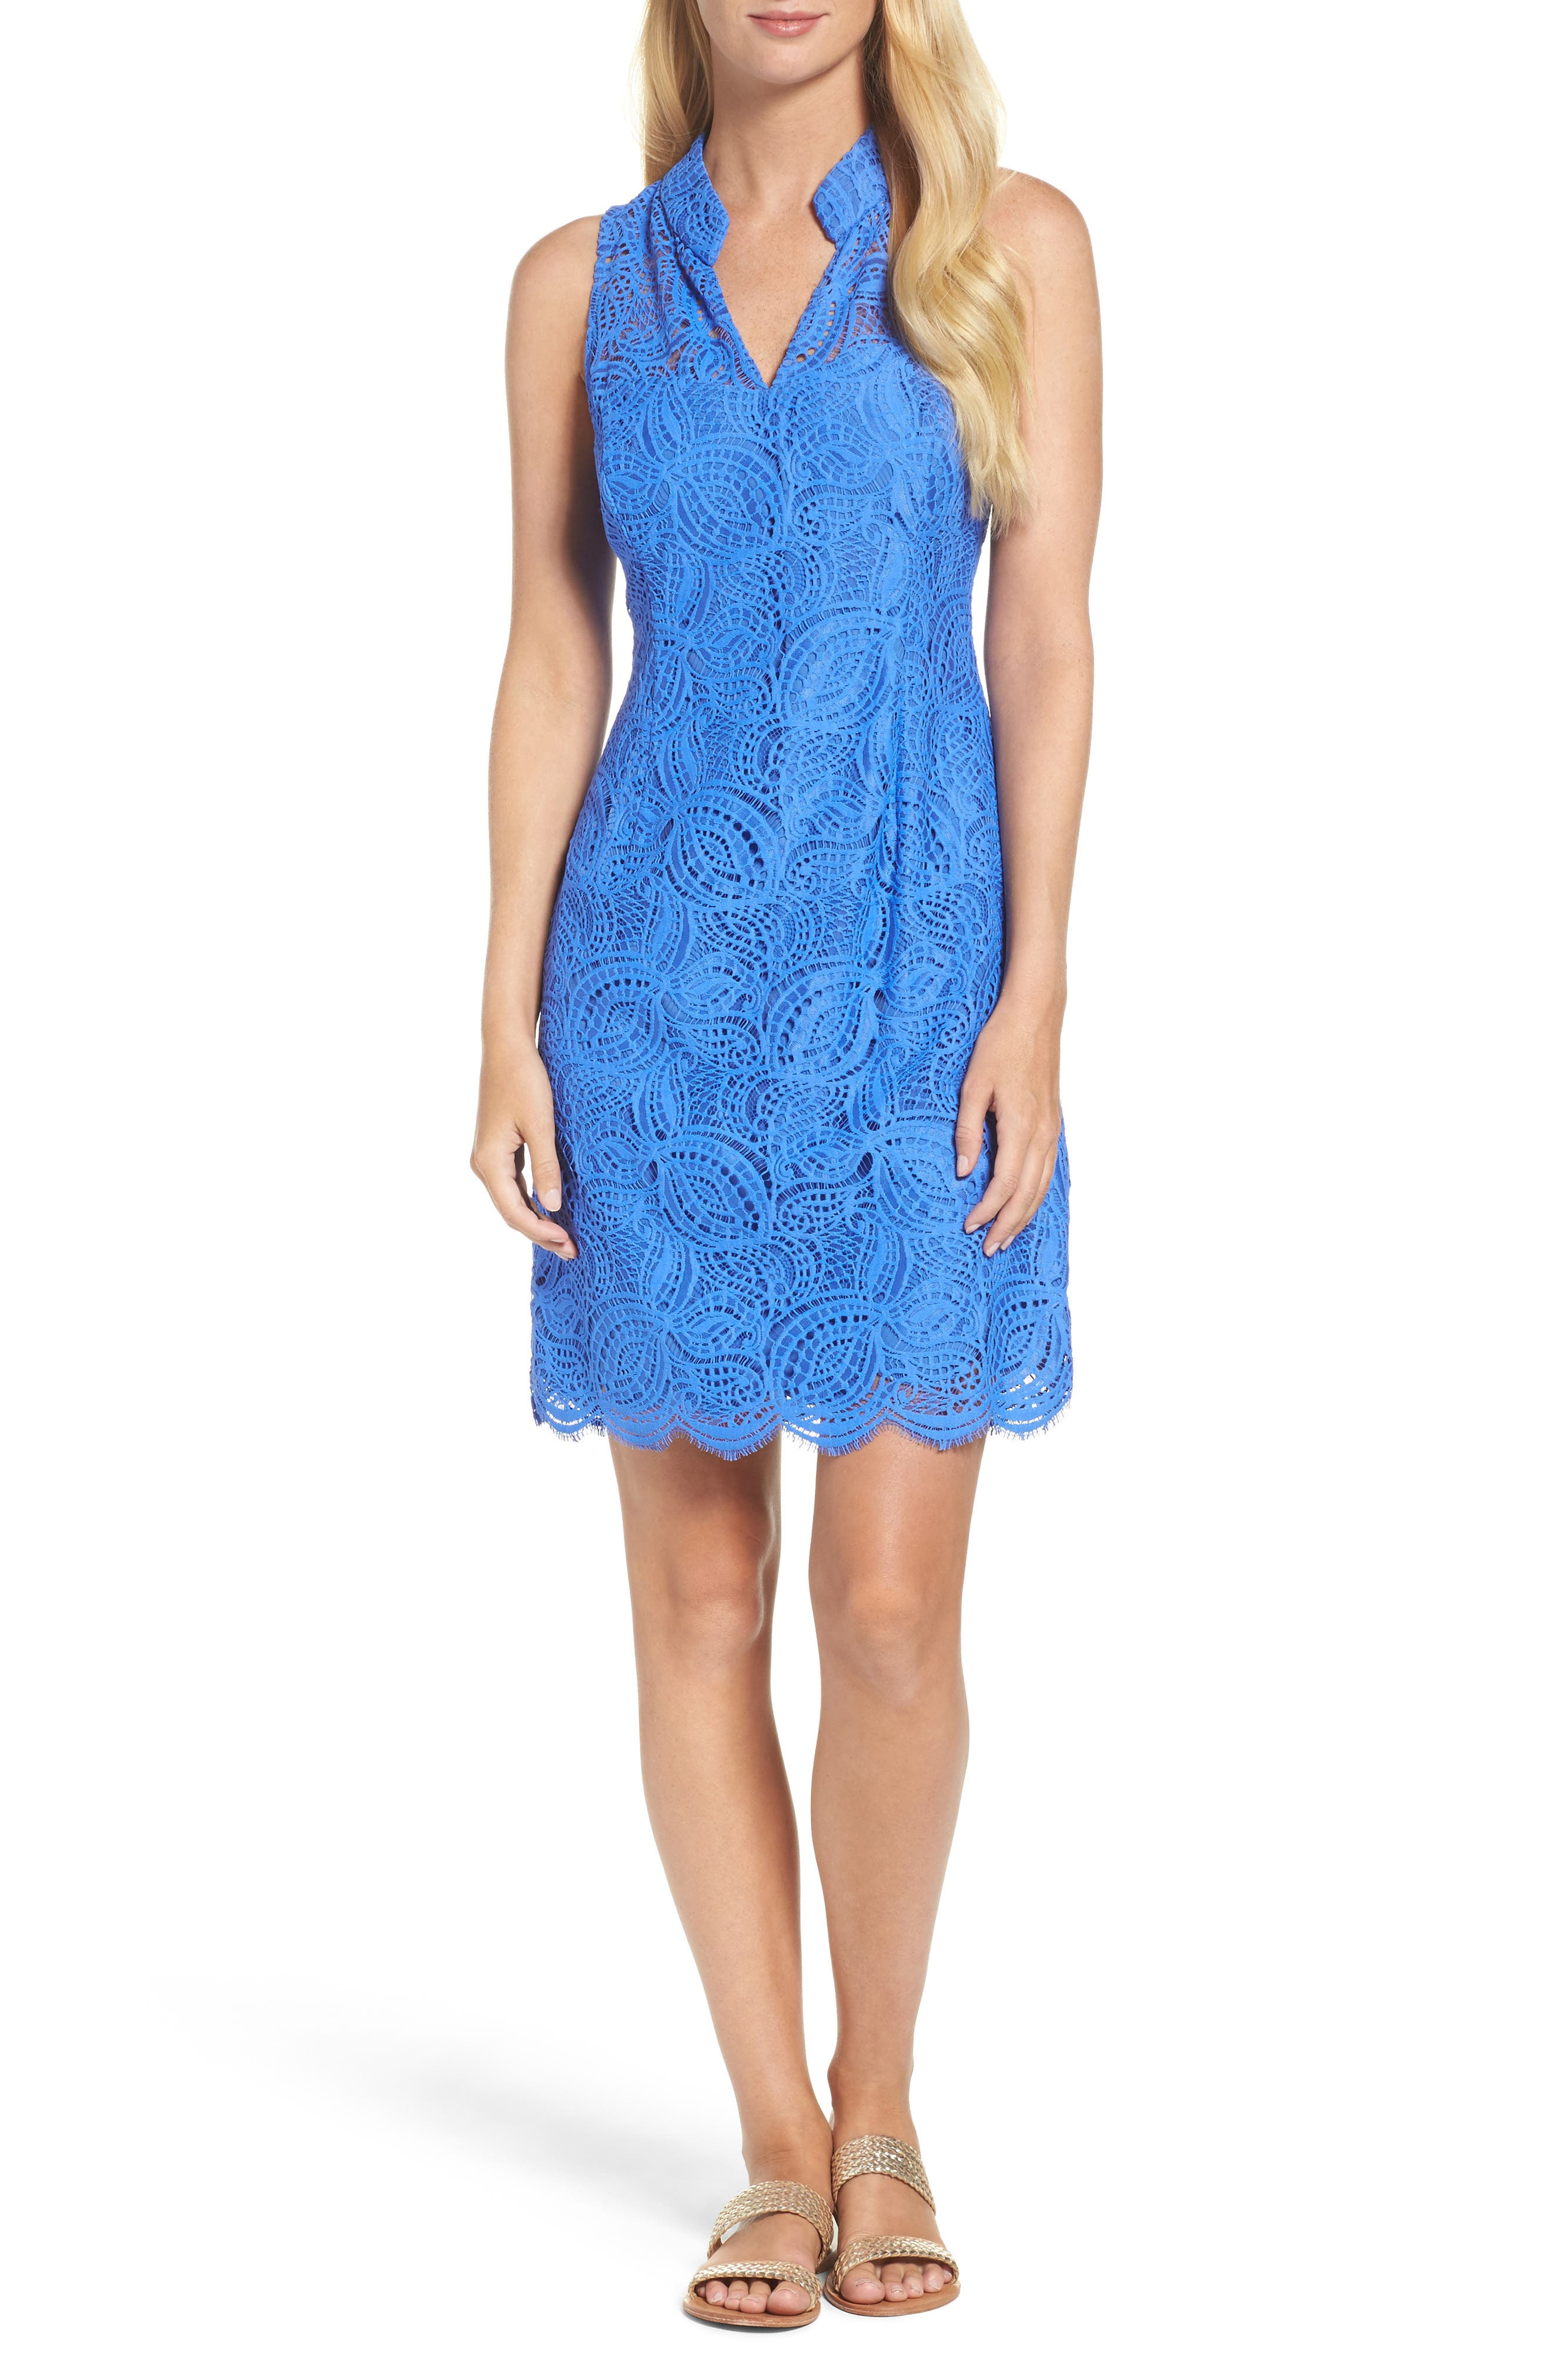 Main Image - Lilly Pulitzer® Alexa Lace Sheath Dress